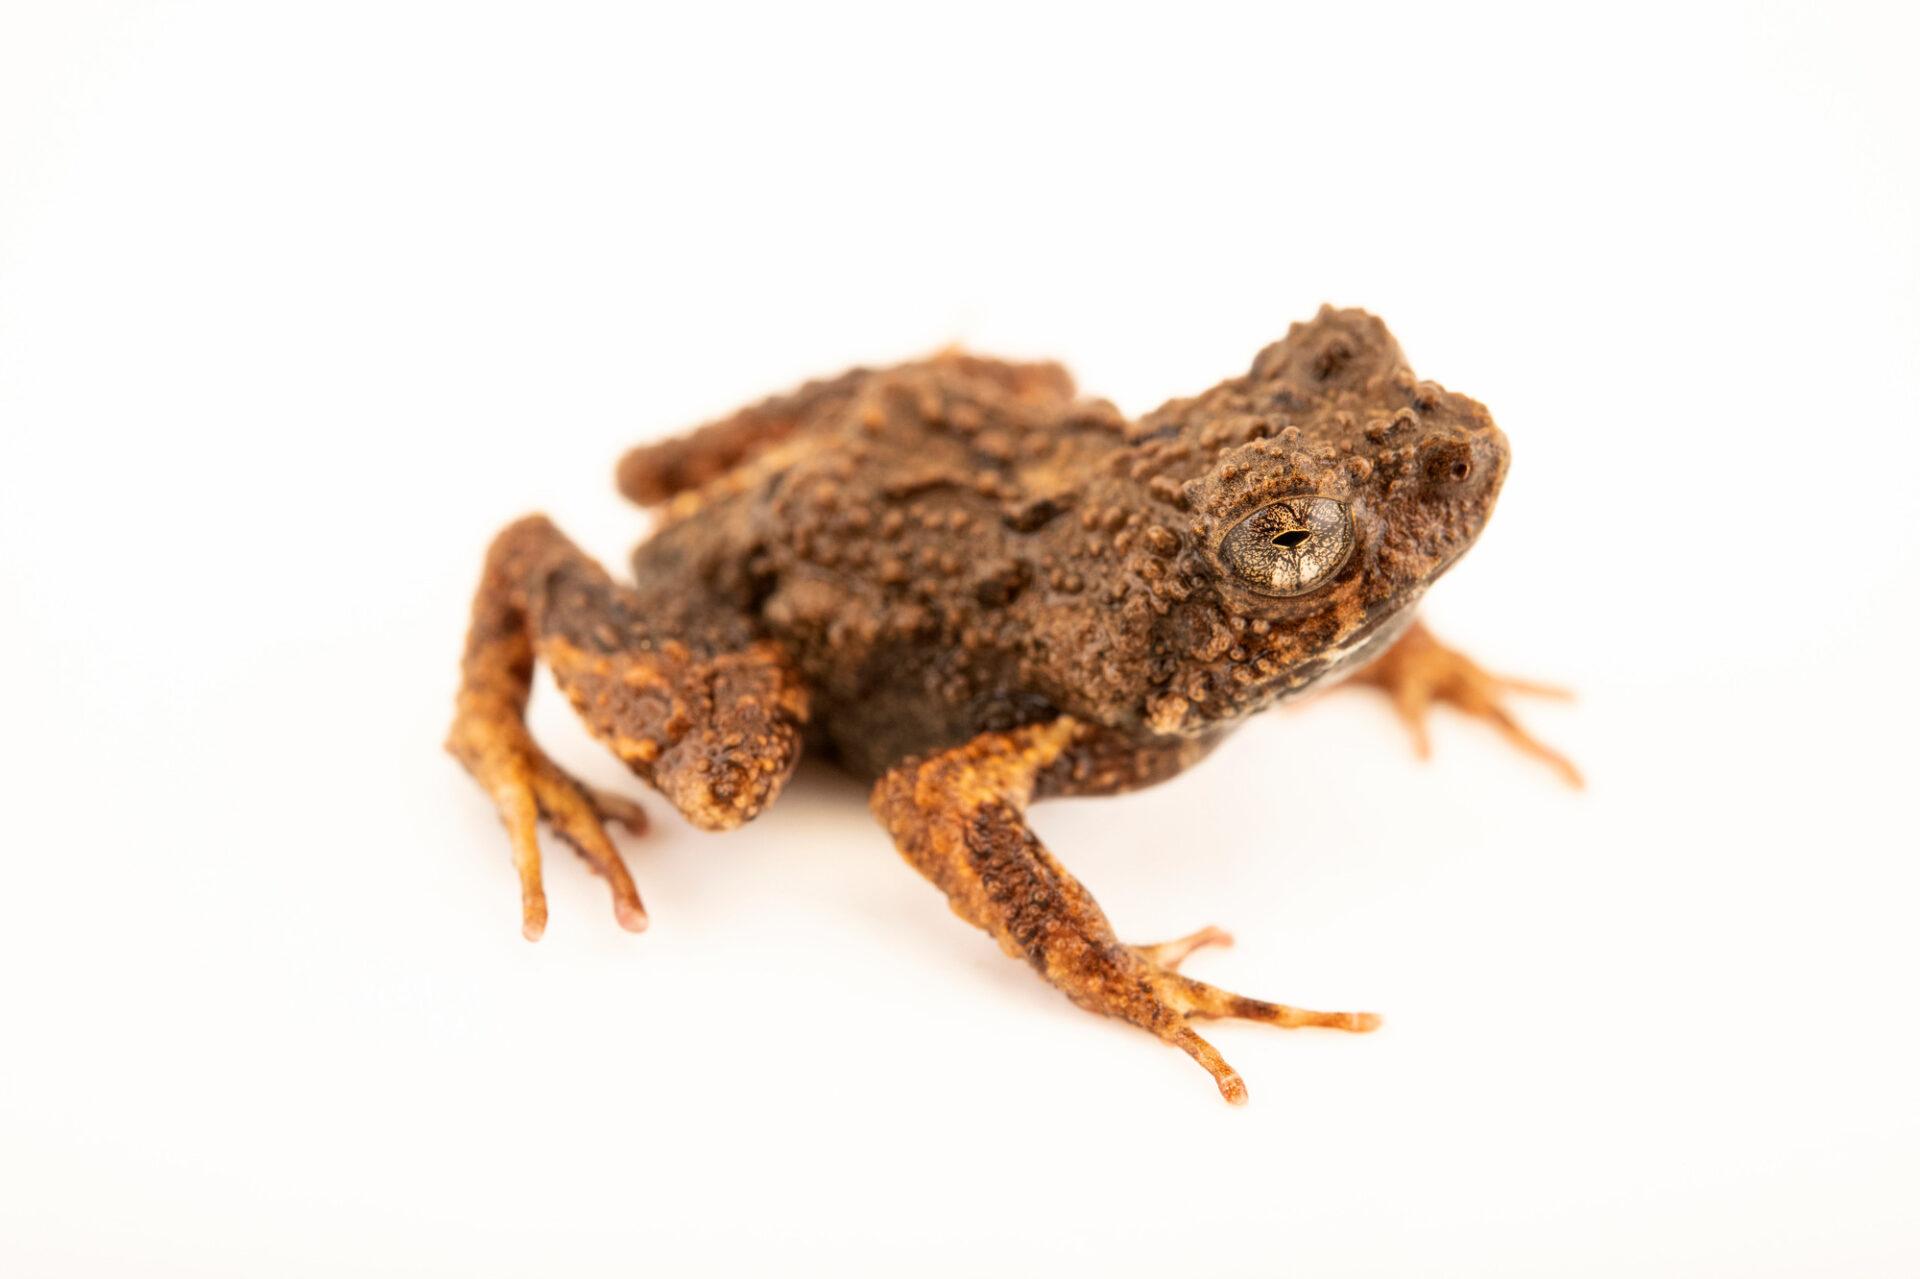 Photo: A Colorado foam-nest frog (Engystomops coloradorum) at Centro Jambatu in Quito, Ecuador.